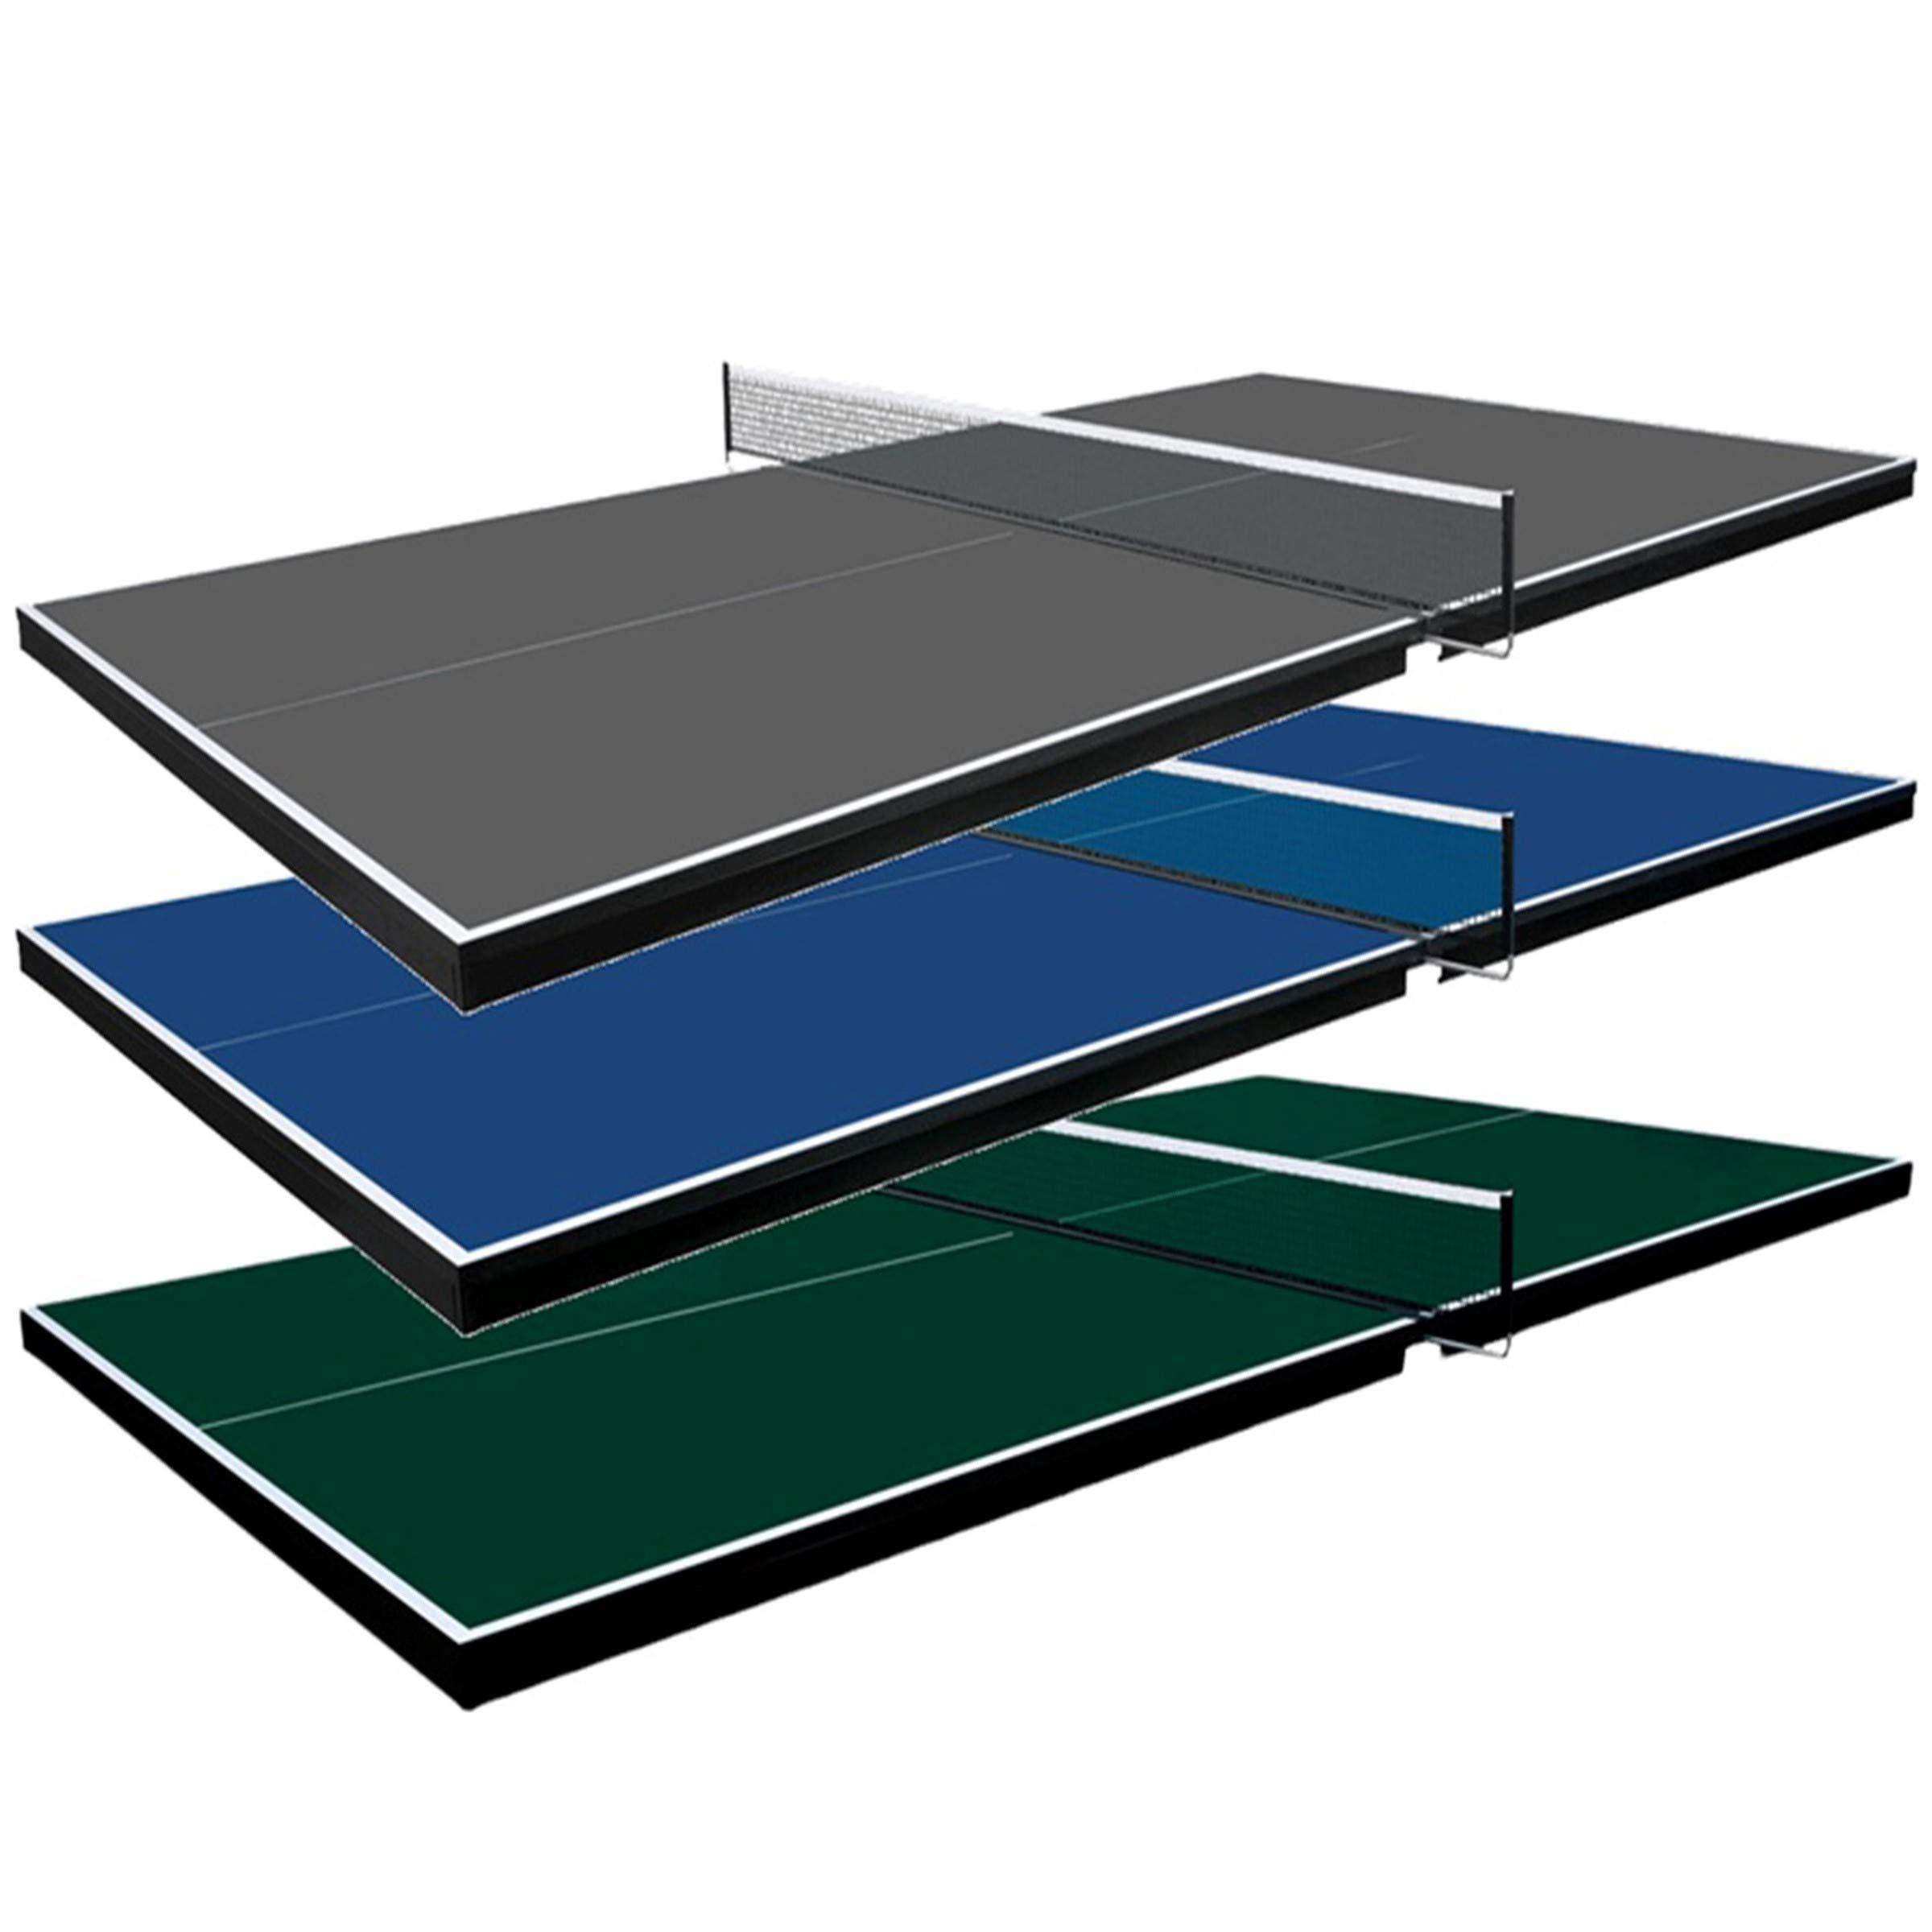 Martin Kilpatrick Ping Pong Table for Billiard Table | Conversion Table Tennis Game Table | Table Tennis Table w/ Warranty | Conversion Top for Pool Table Games | Table Top Games | Ping Pong Table Top